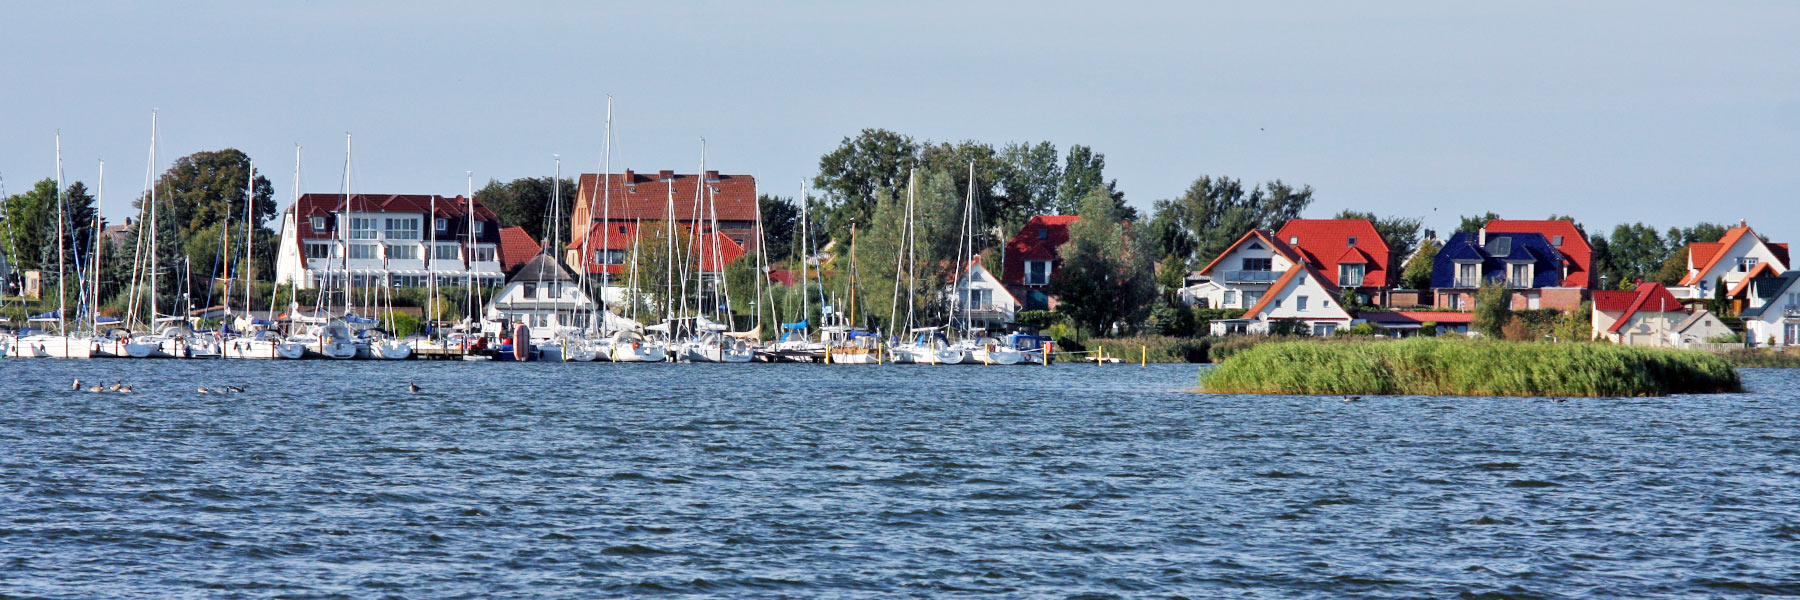 Hafen - Seebad Breege-Juliusruh